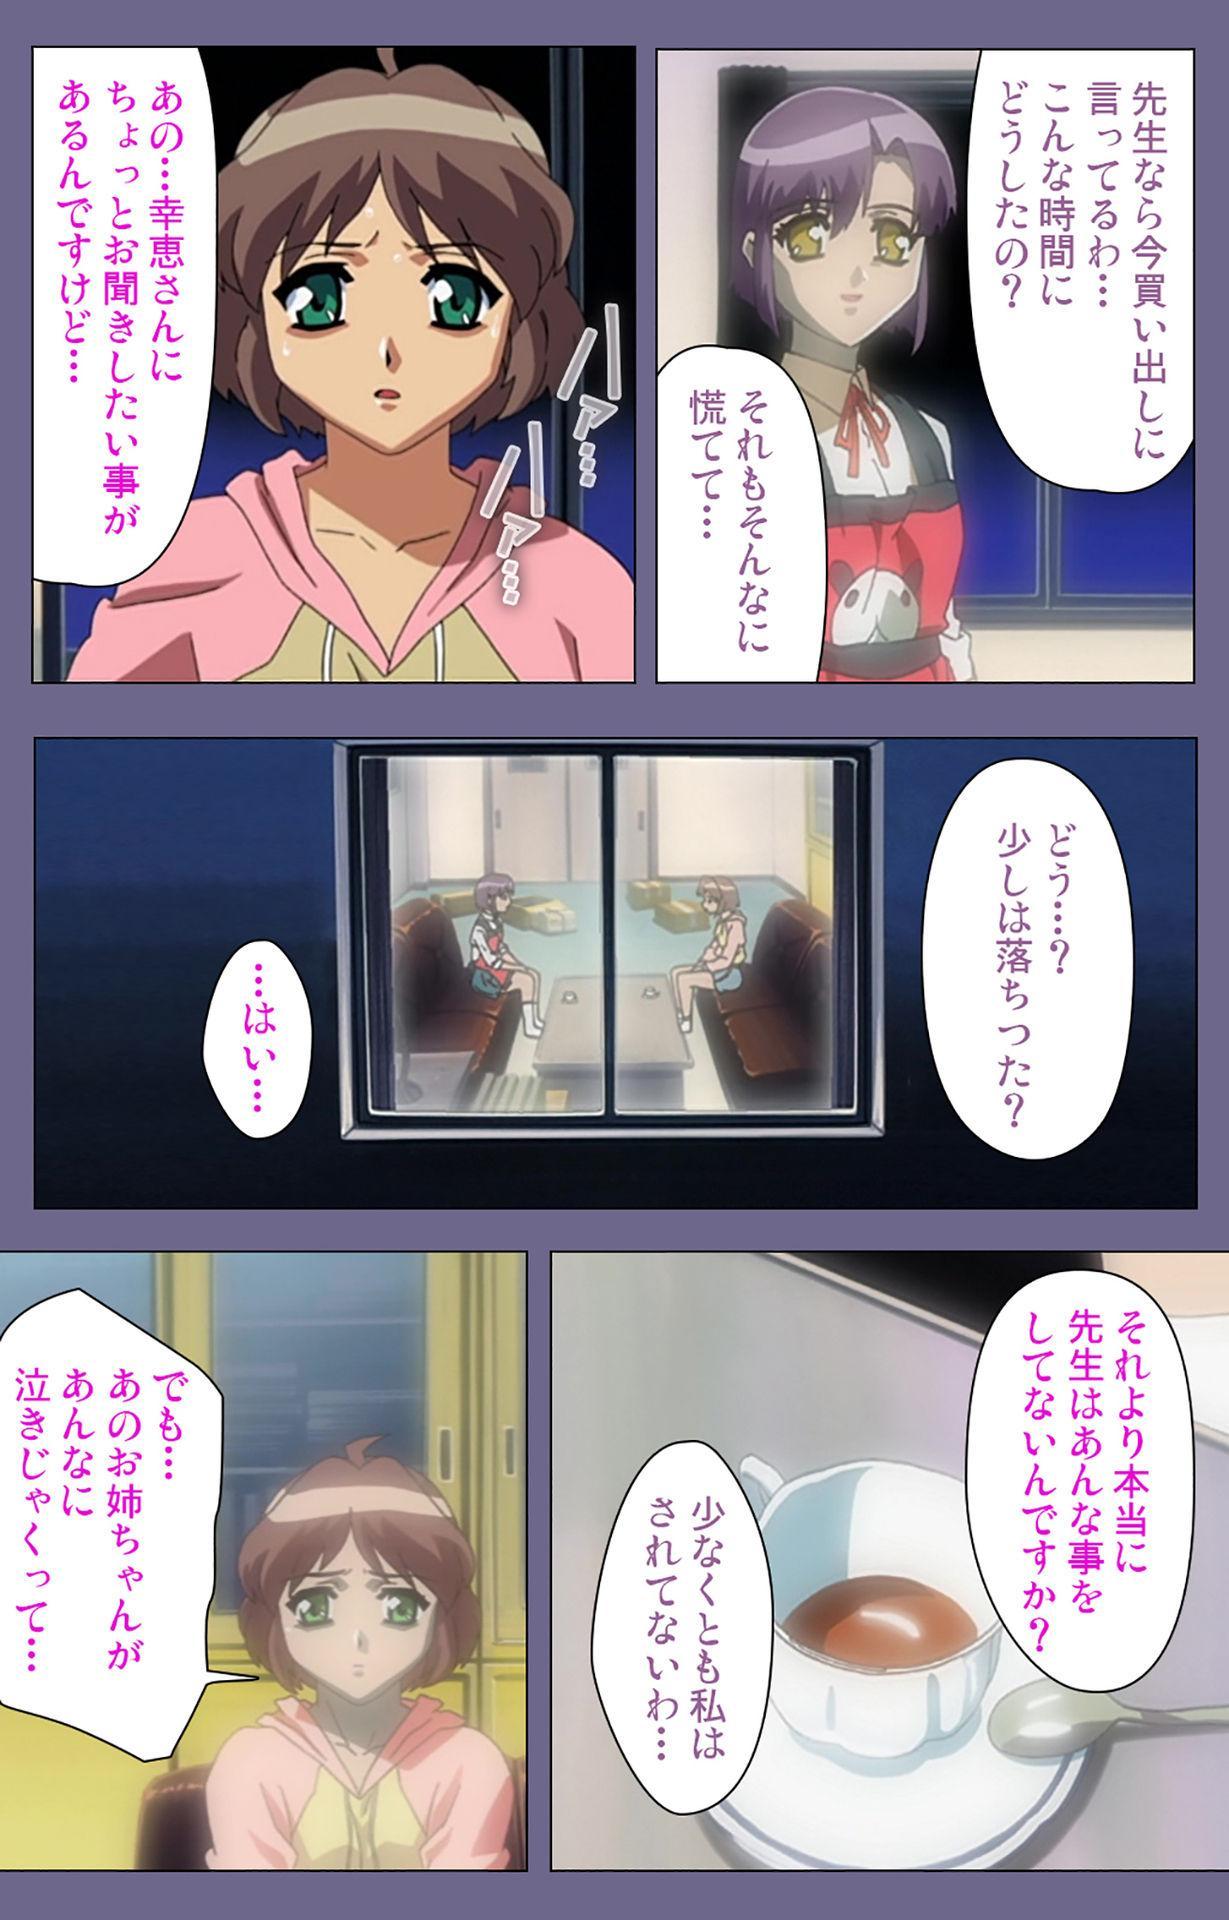 Korashime Kanzenban 241